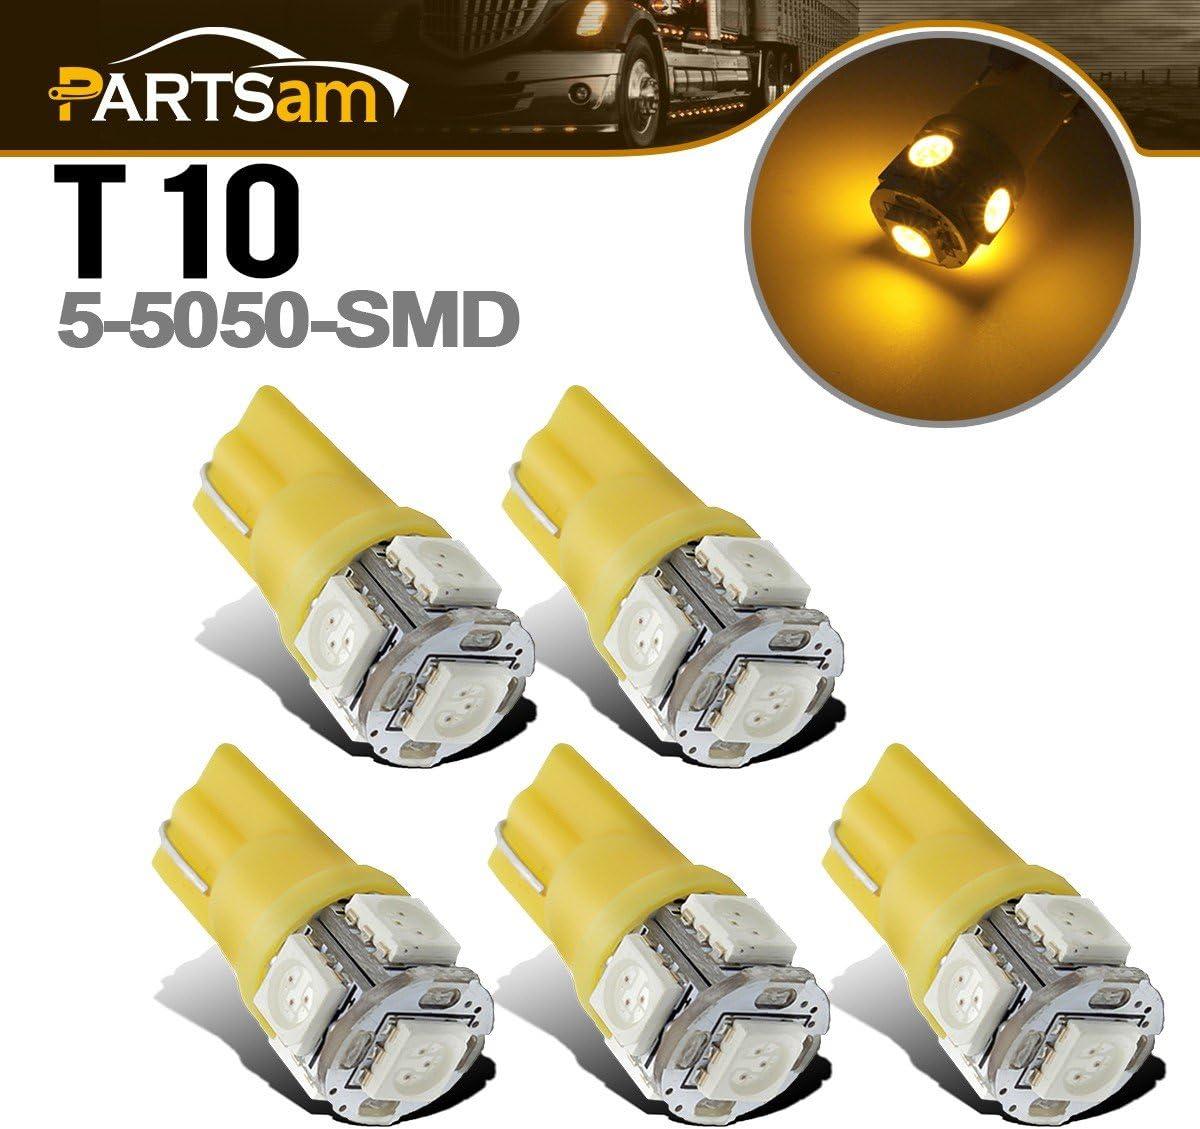 4pcs Yellow T10 W5W 194 5 SMD LED Car Light Bulbs 5050